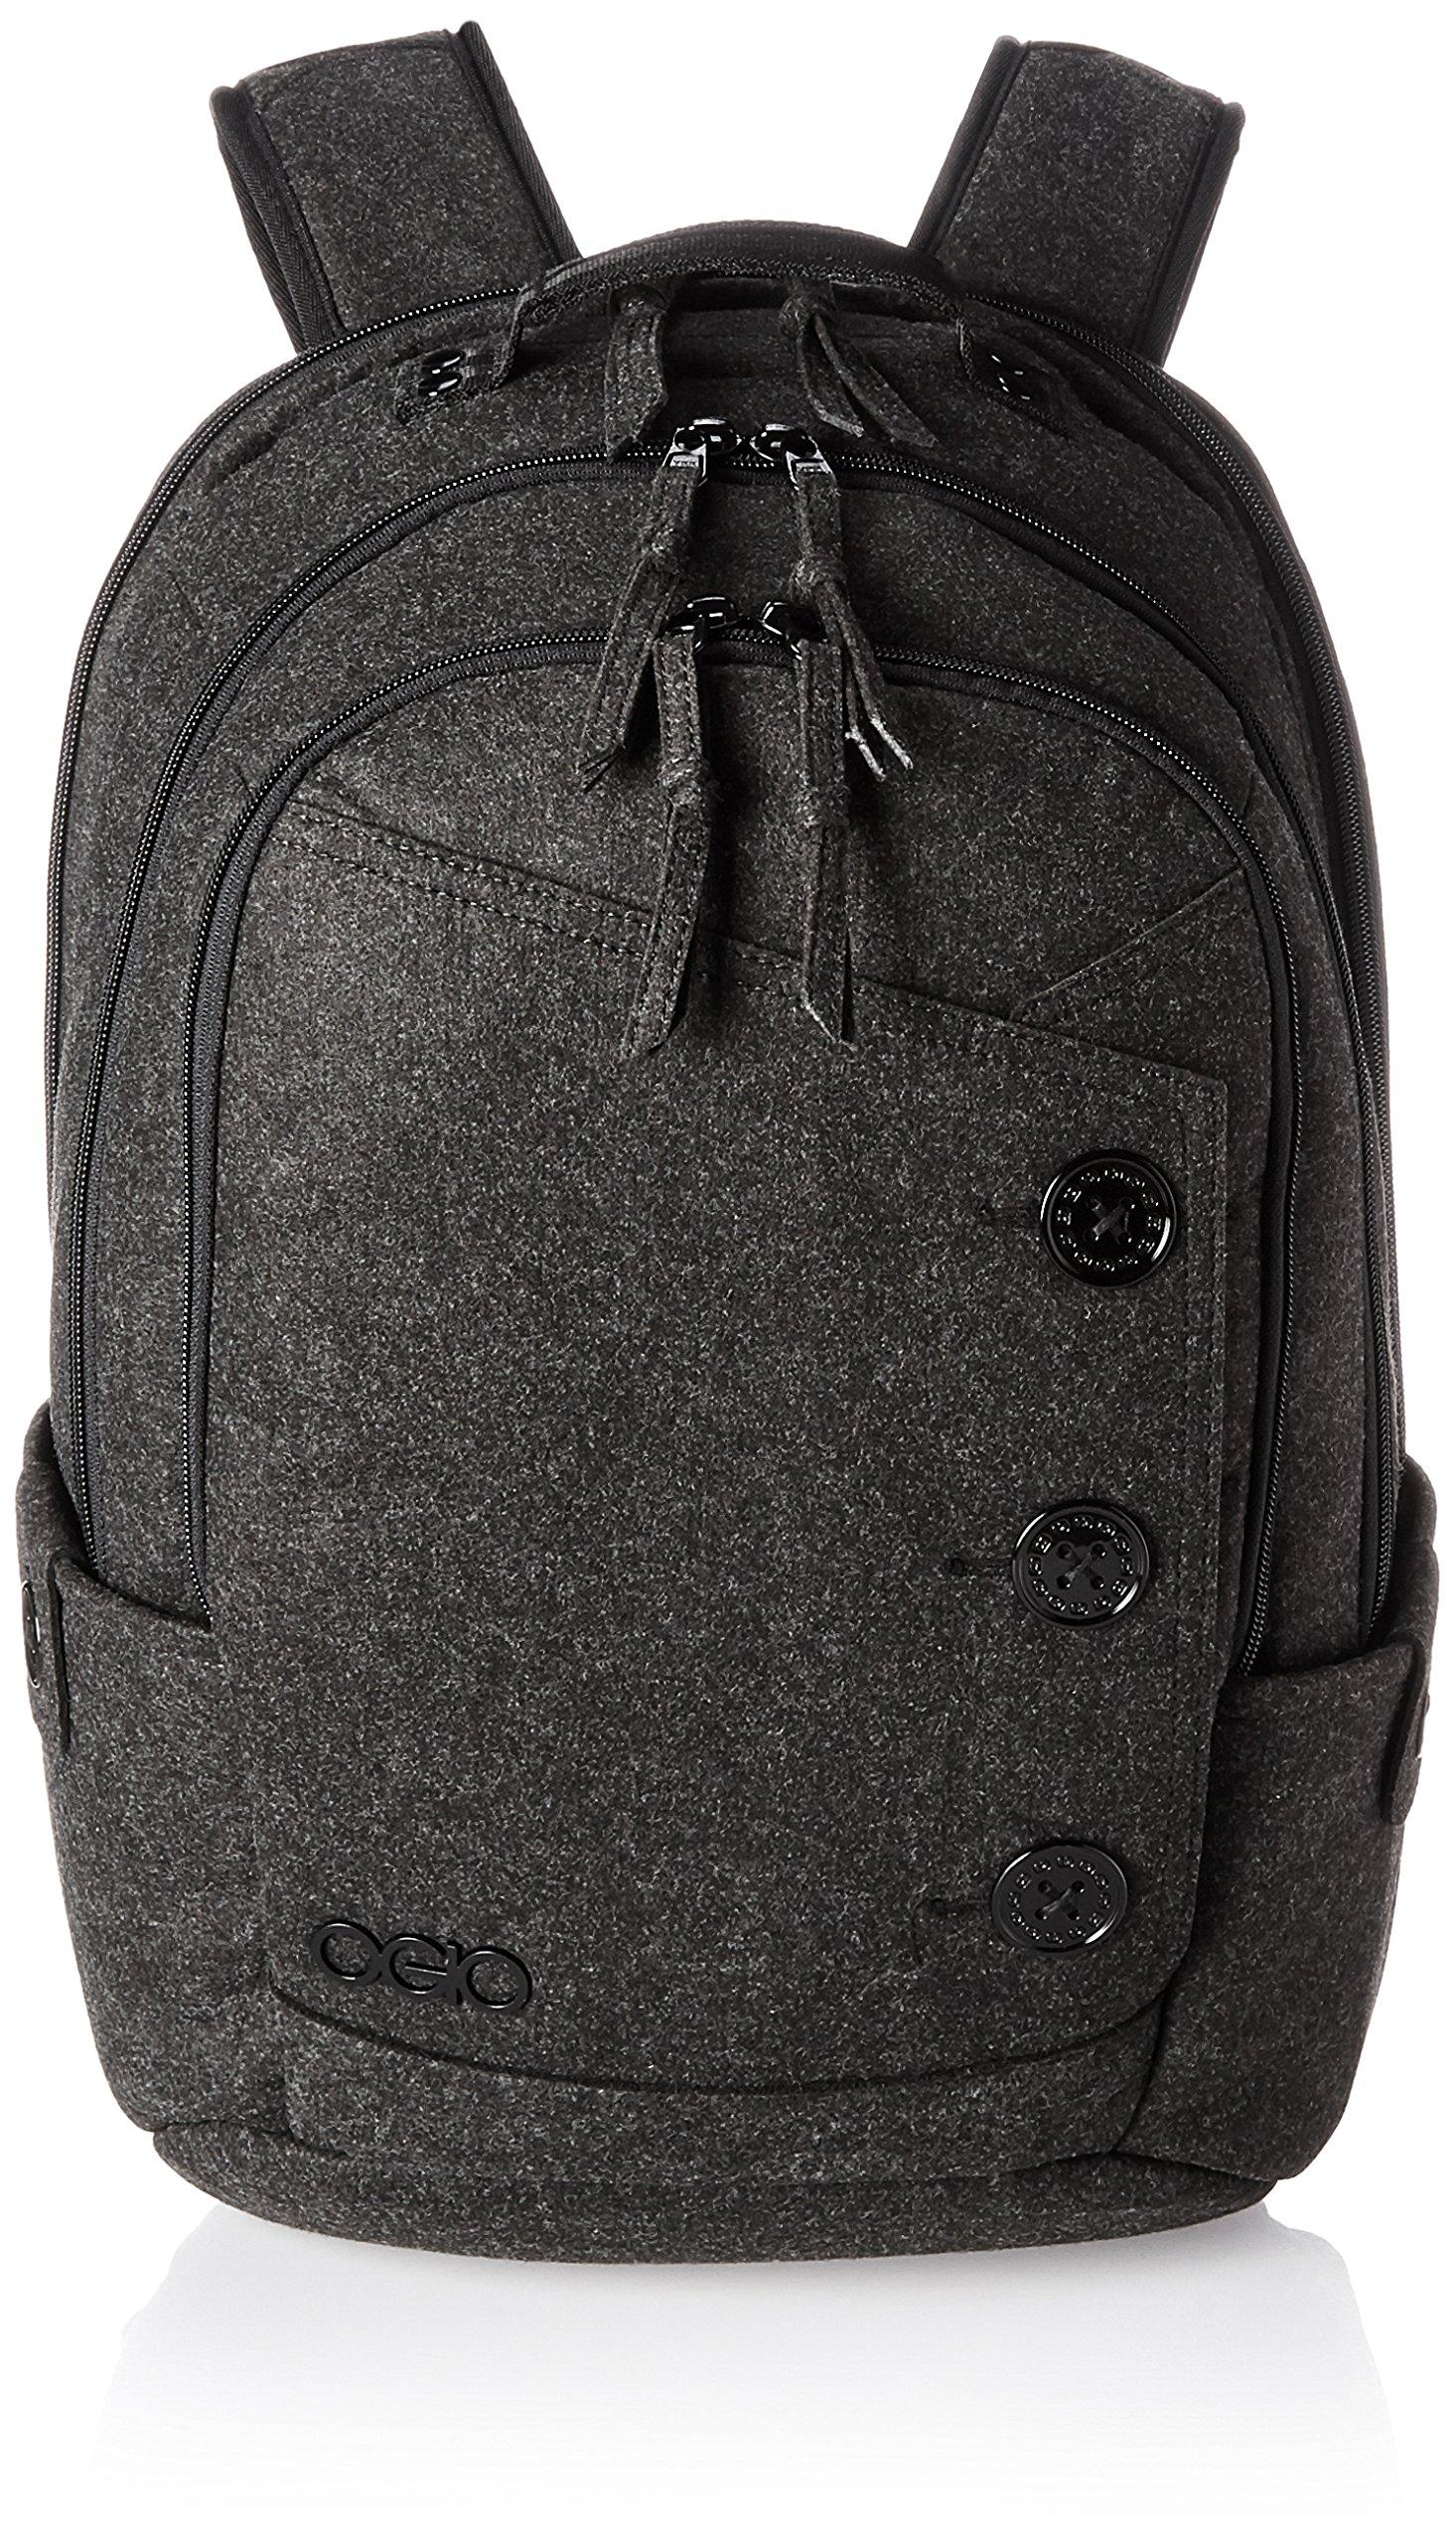 OGIO International Soho Pack, Dark Gray Felt, One Size